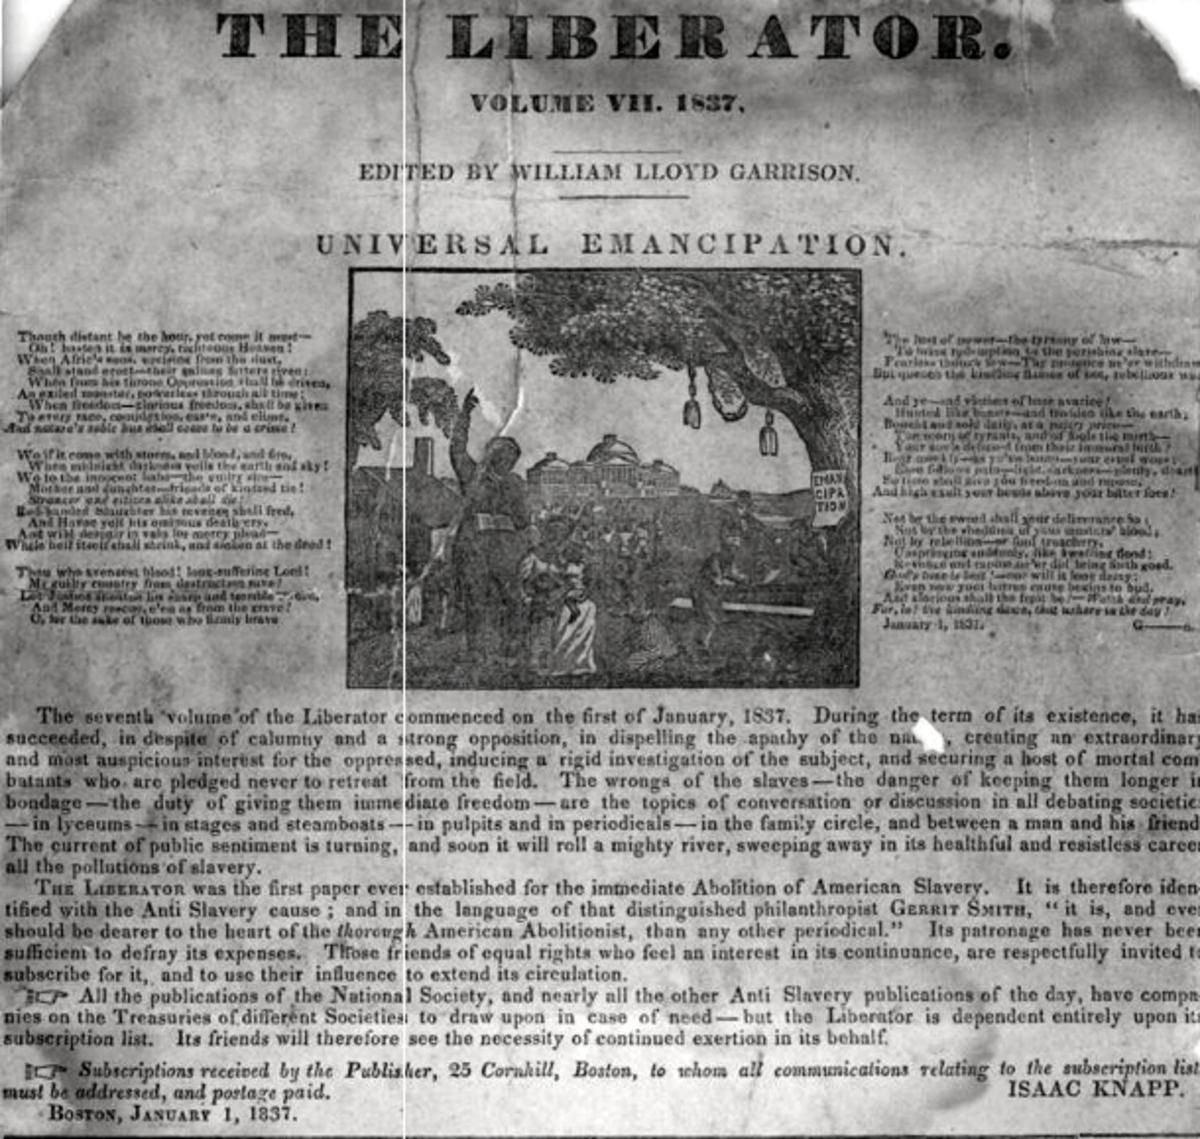 The Liberator Newspaper by William Lloyd Garrison